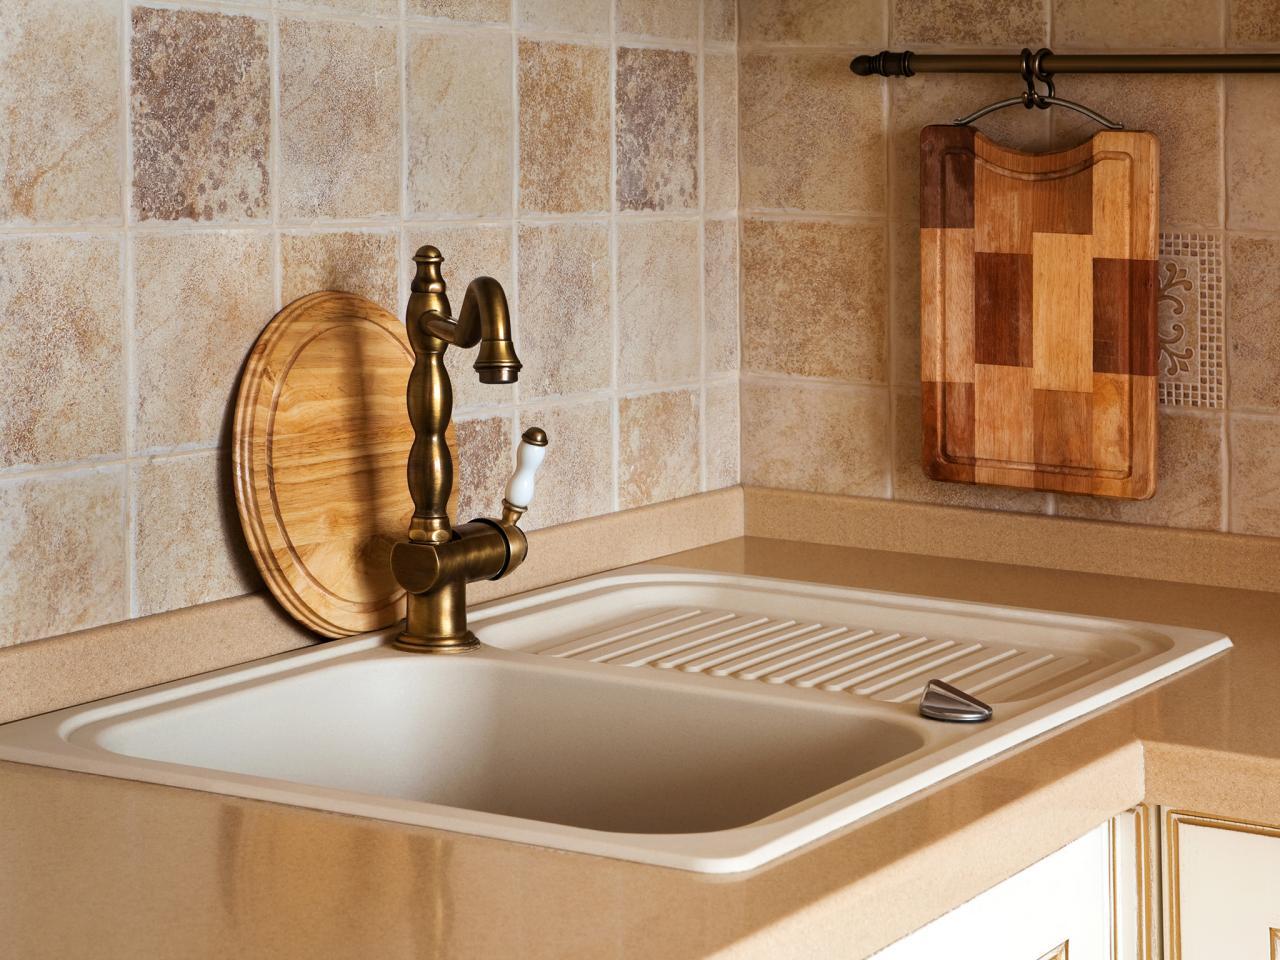 Beautiful Patterned Kitchen Backsplash Design kitchen tile backsplash designs